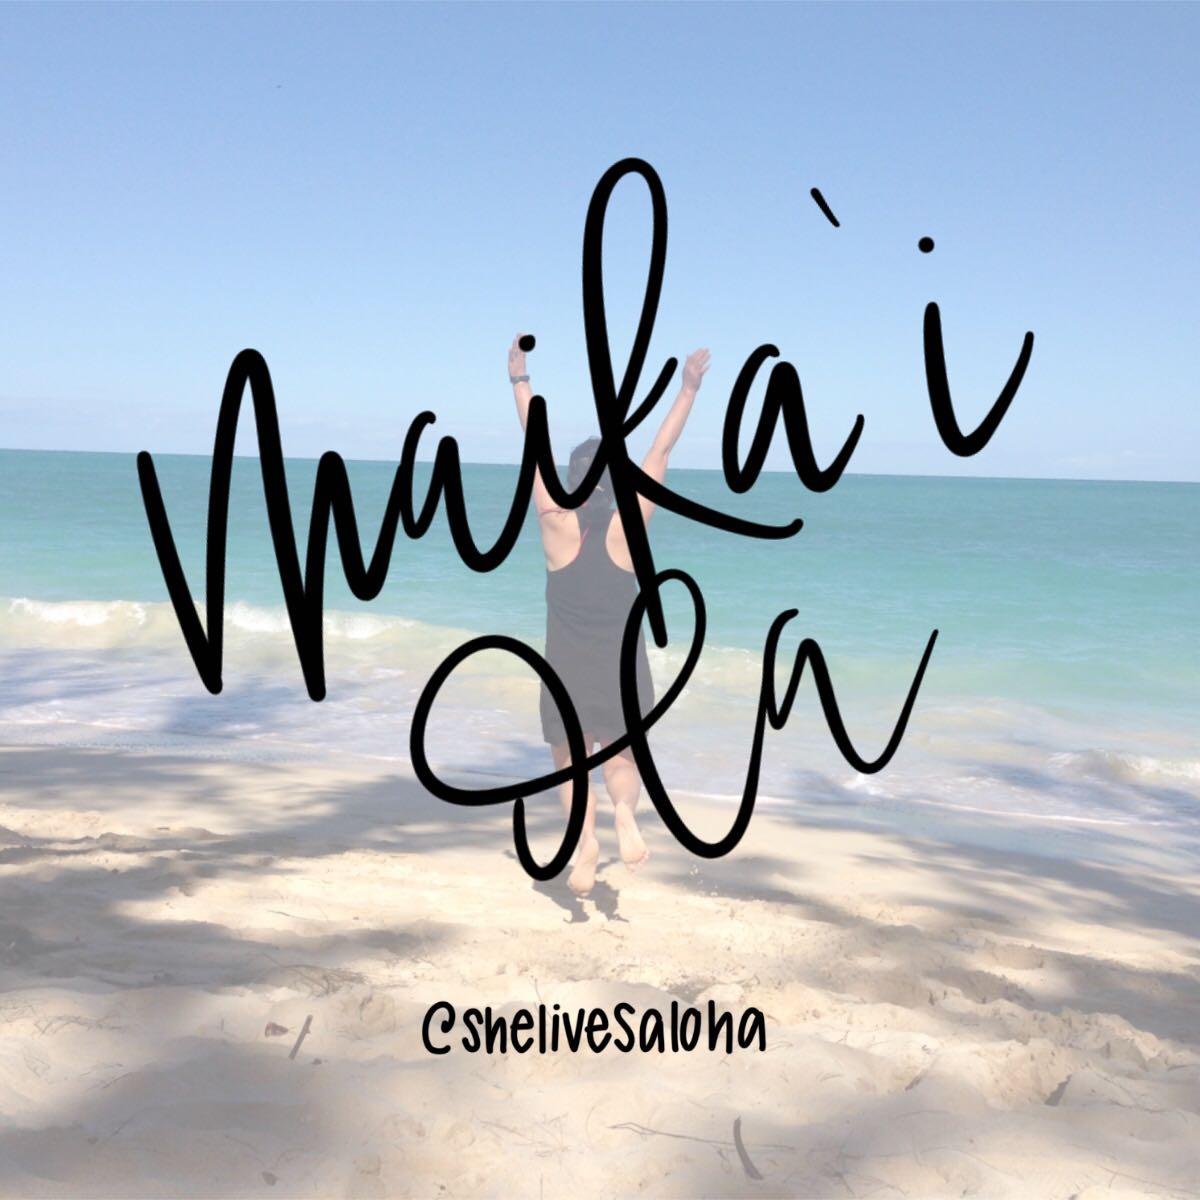 Good Life in Hawaiian: Maika'i Ola